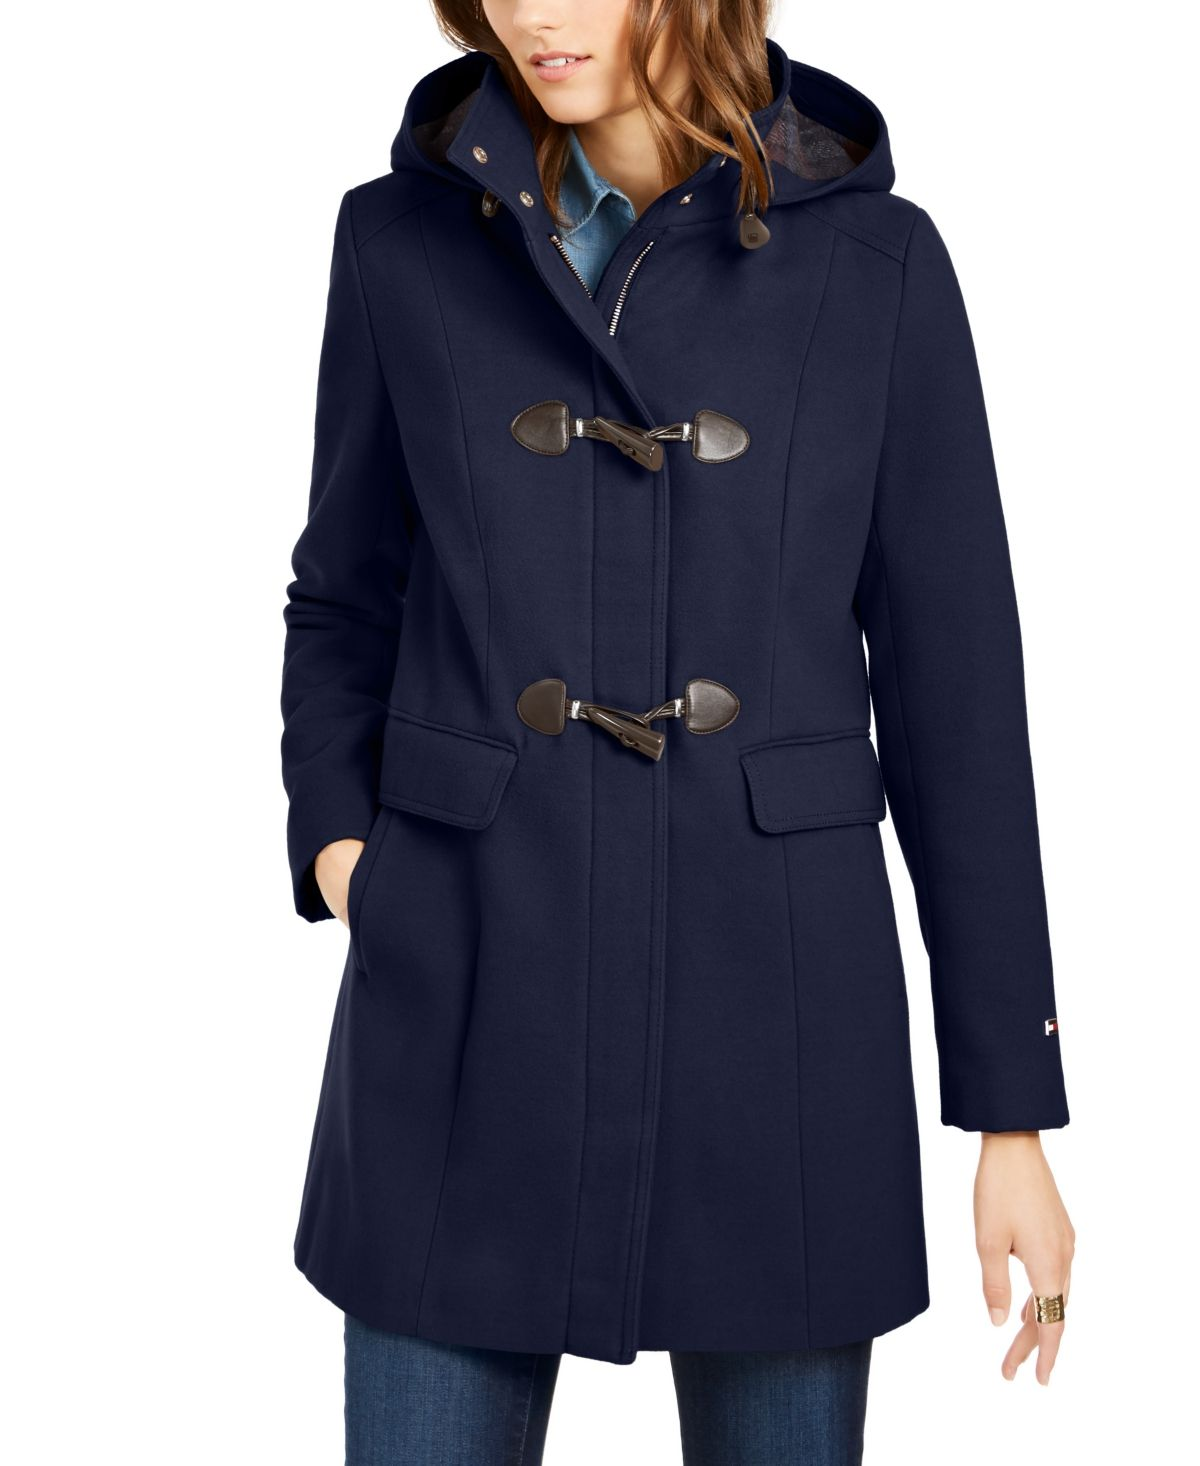 Tommy Hilfiger Hooded Toggle Coat Created For Macy S Coats For Women Coat Toggle Coat [ 1466 x 1200 Pixel ]